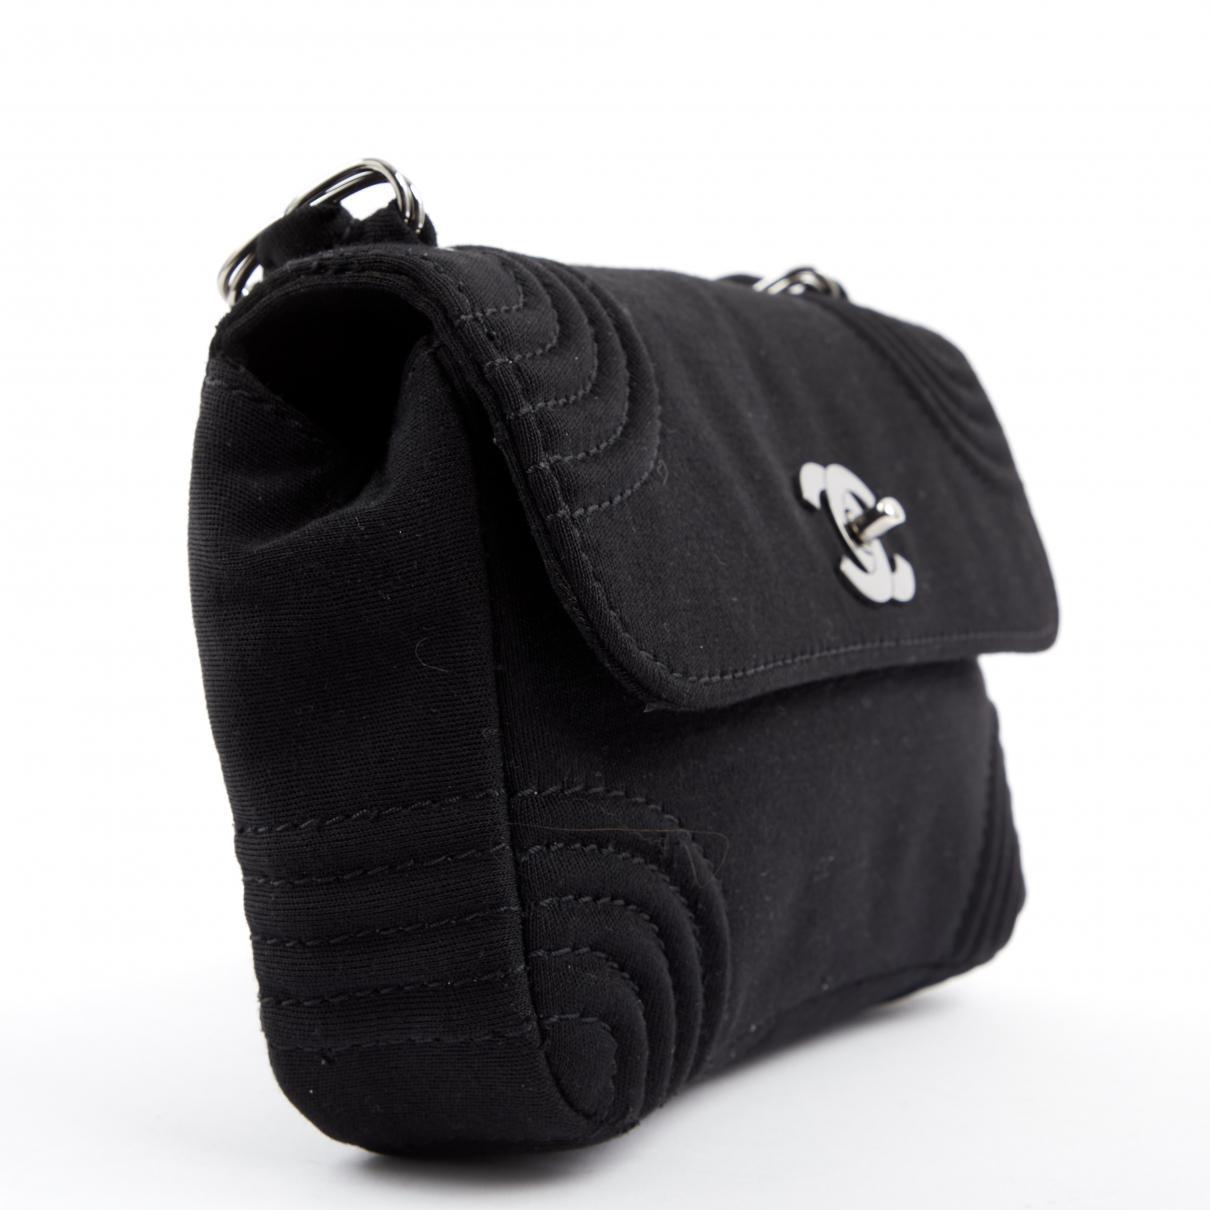 f1418847958a Chanel - Vintage Timeless Black Cloth Handbag - Lyst. View fullscreen